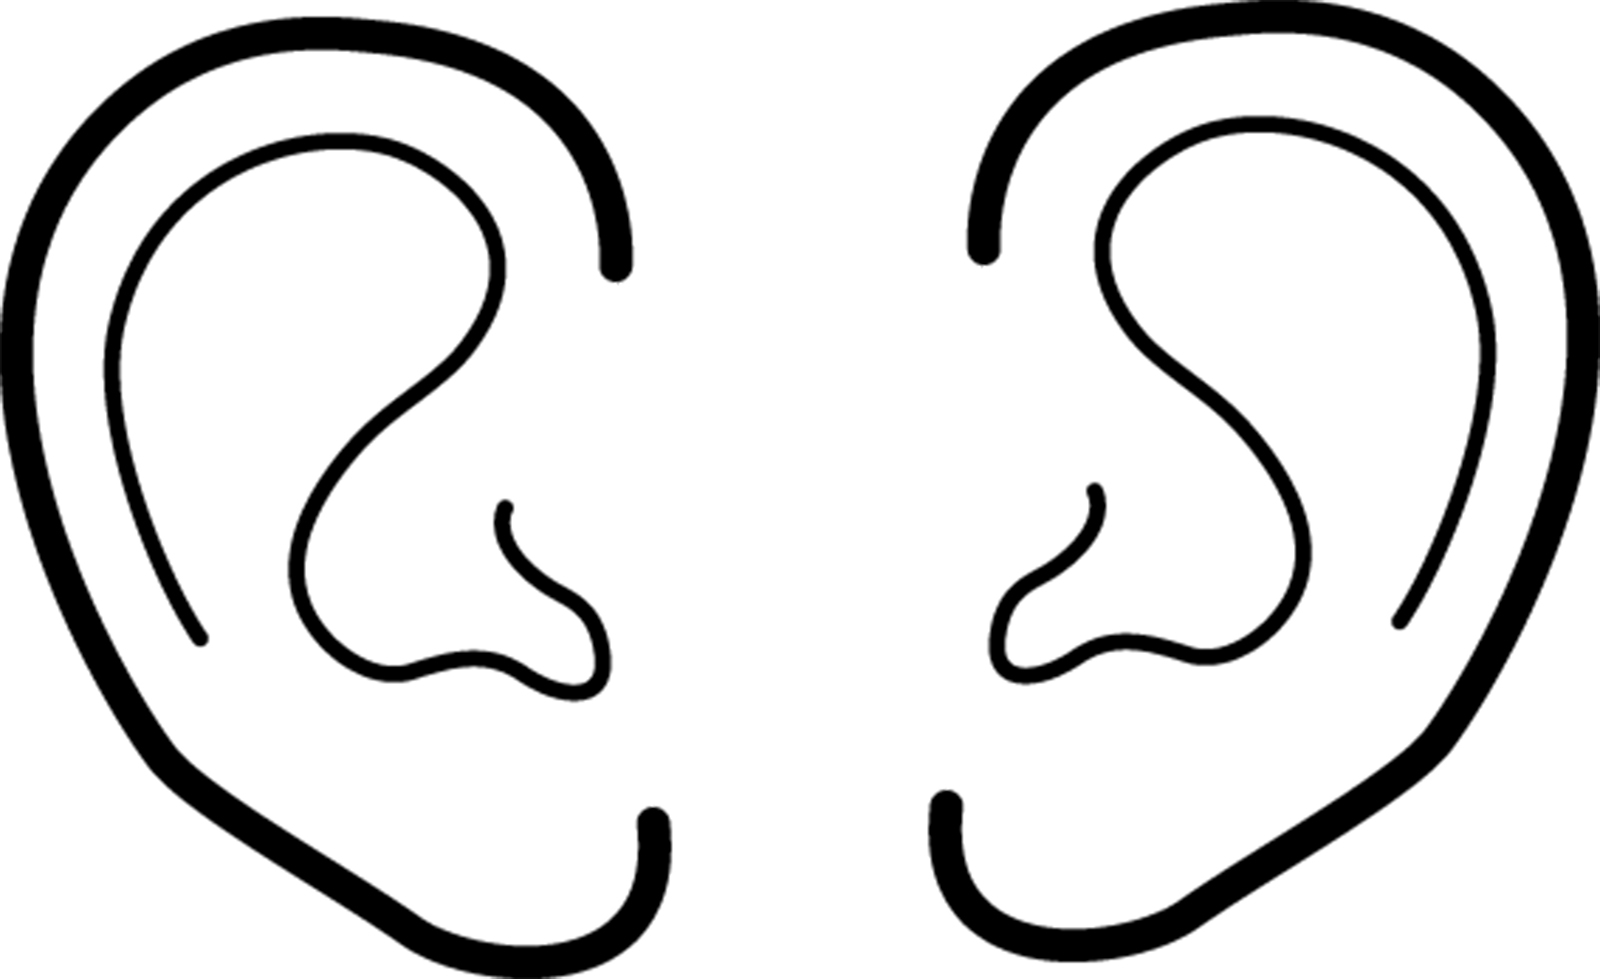 Ear clipart earclipart images - Ears Clip Art